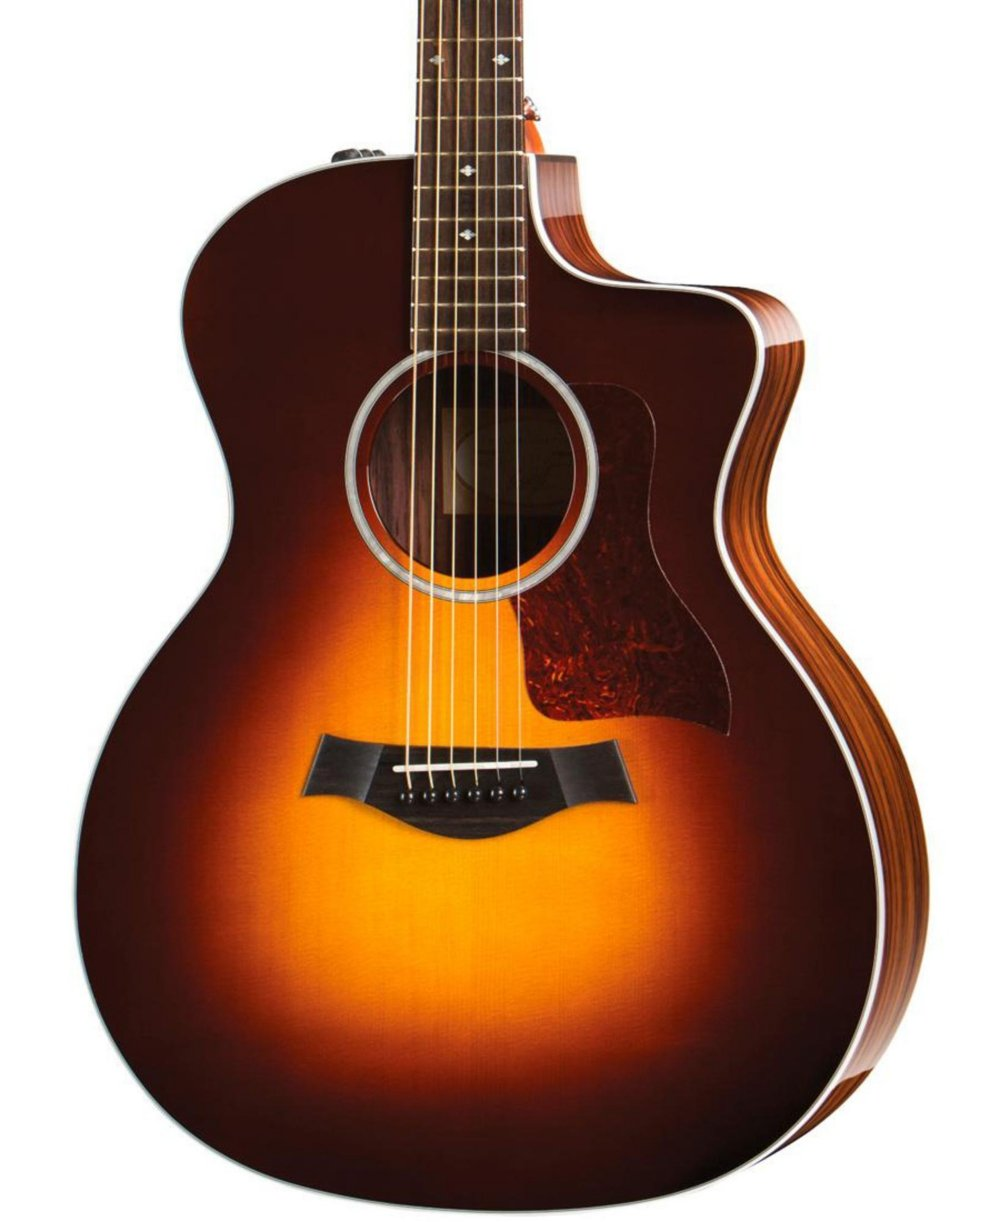 taylor 200 series 214ce dlx grand auditorium acoustic electric guitar guitar affinity. Black Bedroom Furniture Sets. Home Design Ideas